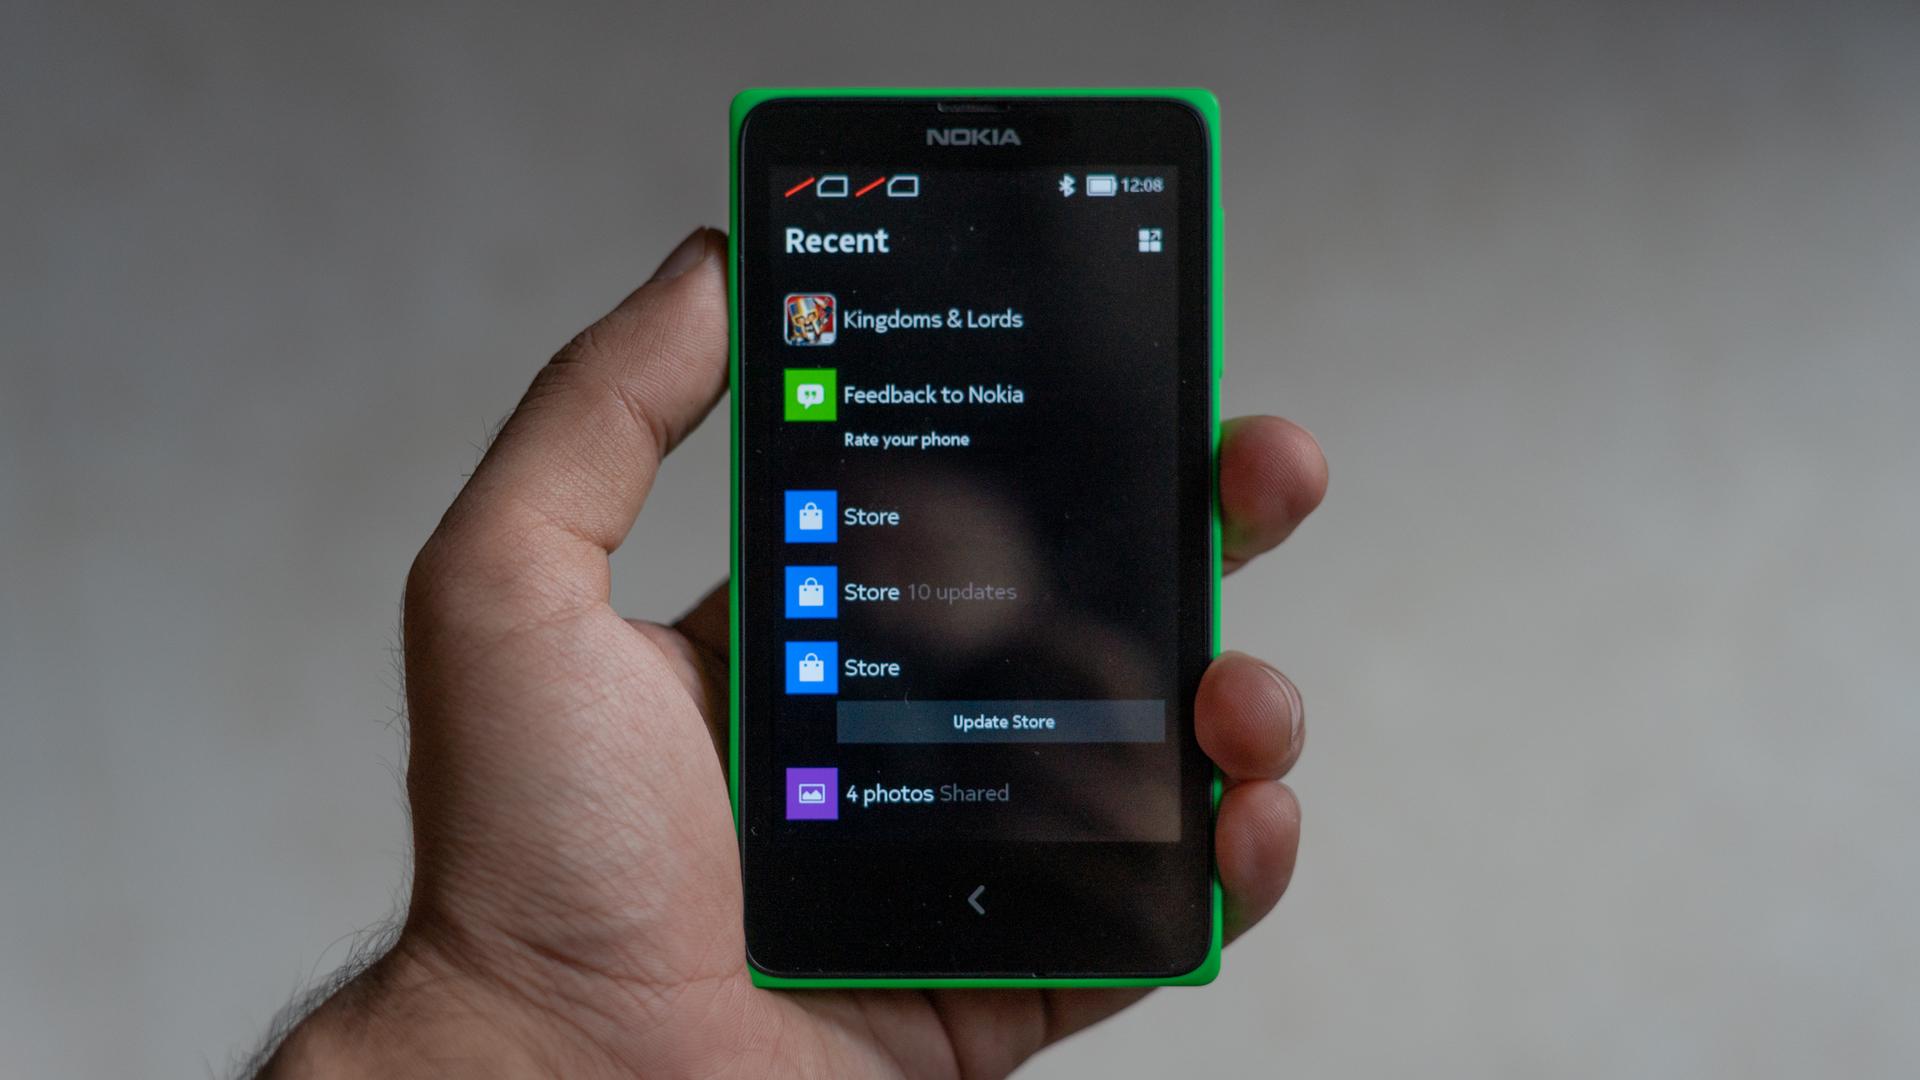 Nokia X Nokia XL in hand showing size